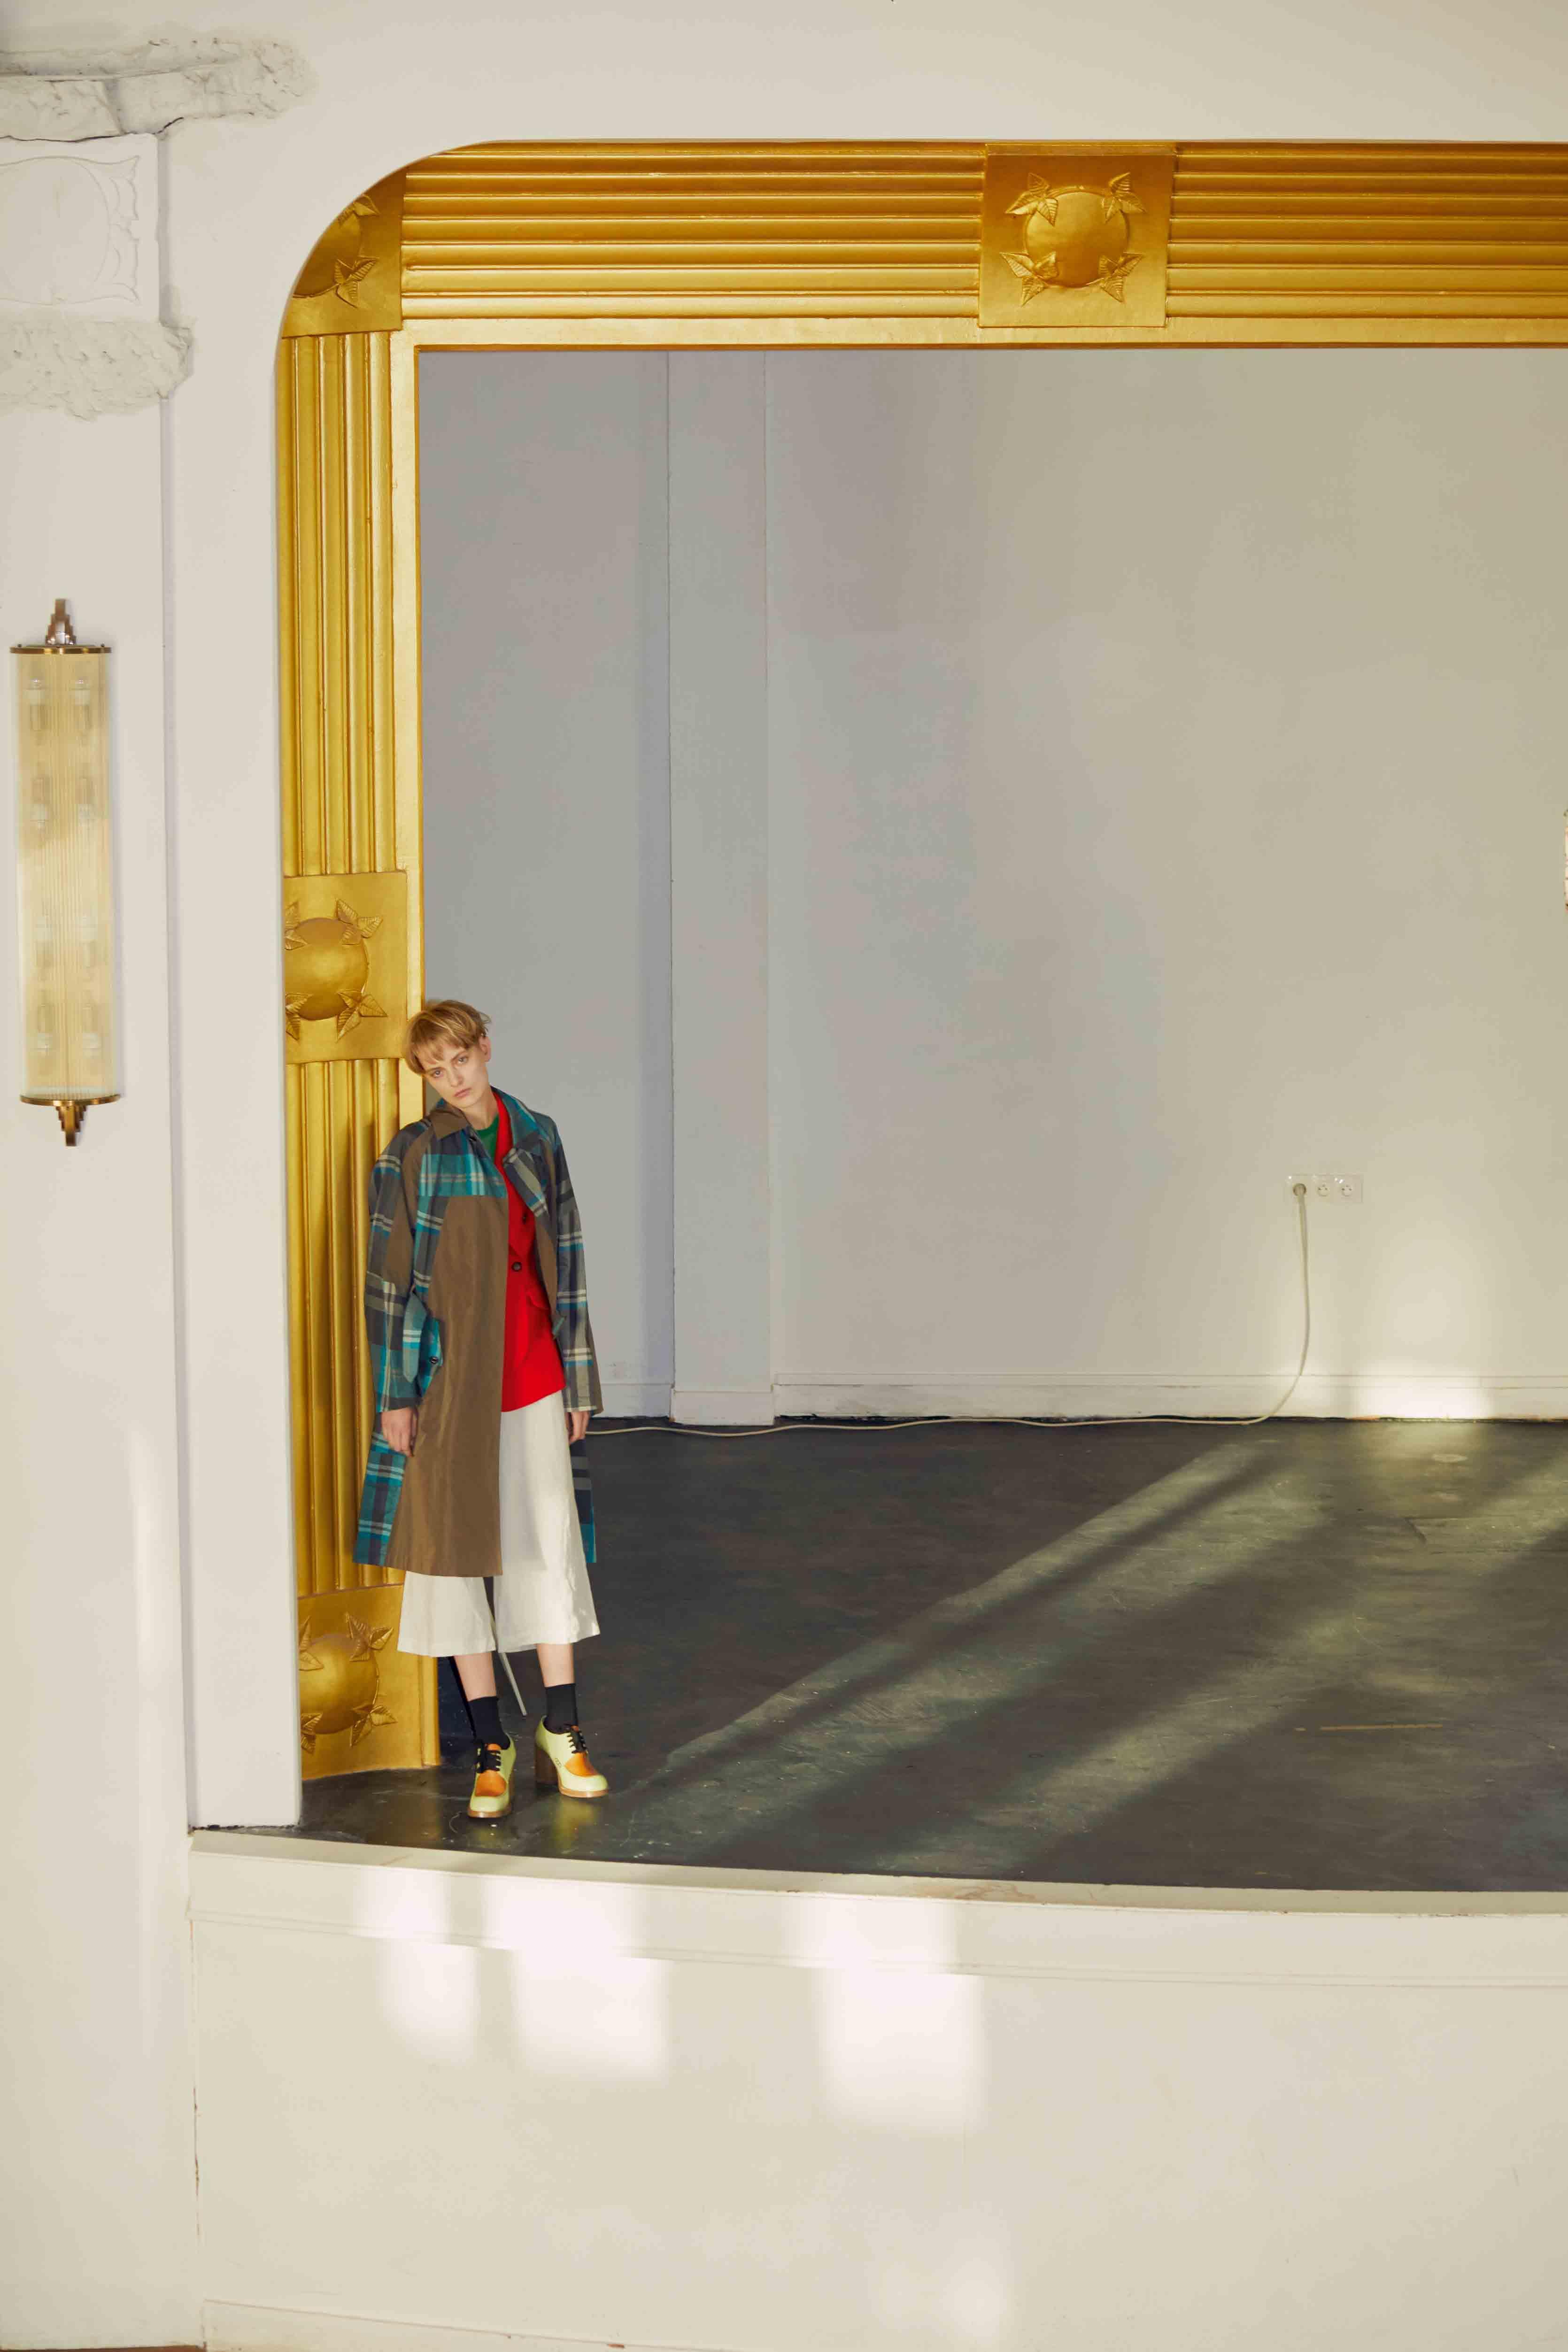 Trench coat, KOLOR. Cotton jacket, ALTUZARRA. Linen trousers, 120% LINO. Socks, FALKE. Shoes, MARNI. Model: Sunniva Vaatevik from Viva Model Management. Hairstyle: Olivier de Vriendt from Artlist Paris. Makeup: Satoko Watanabe from Artlist Paris. Manicure: Laura Forget from Artlist Paris. Production assistant: Fernando Damasceno.